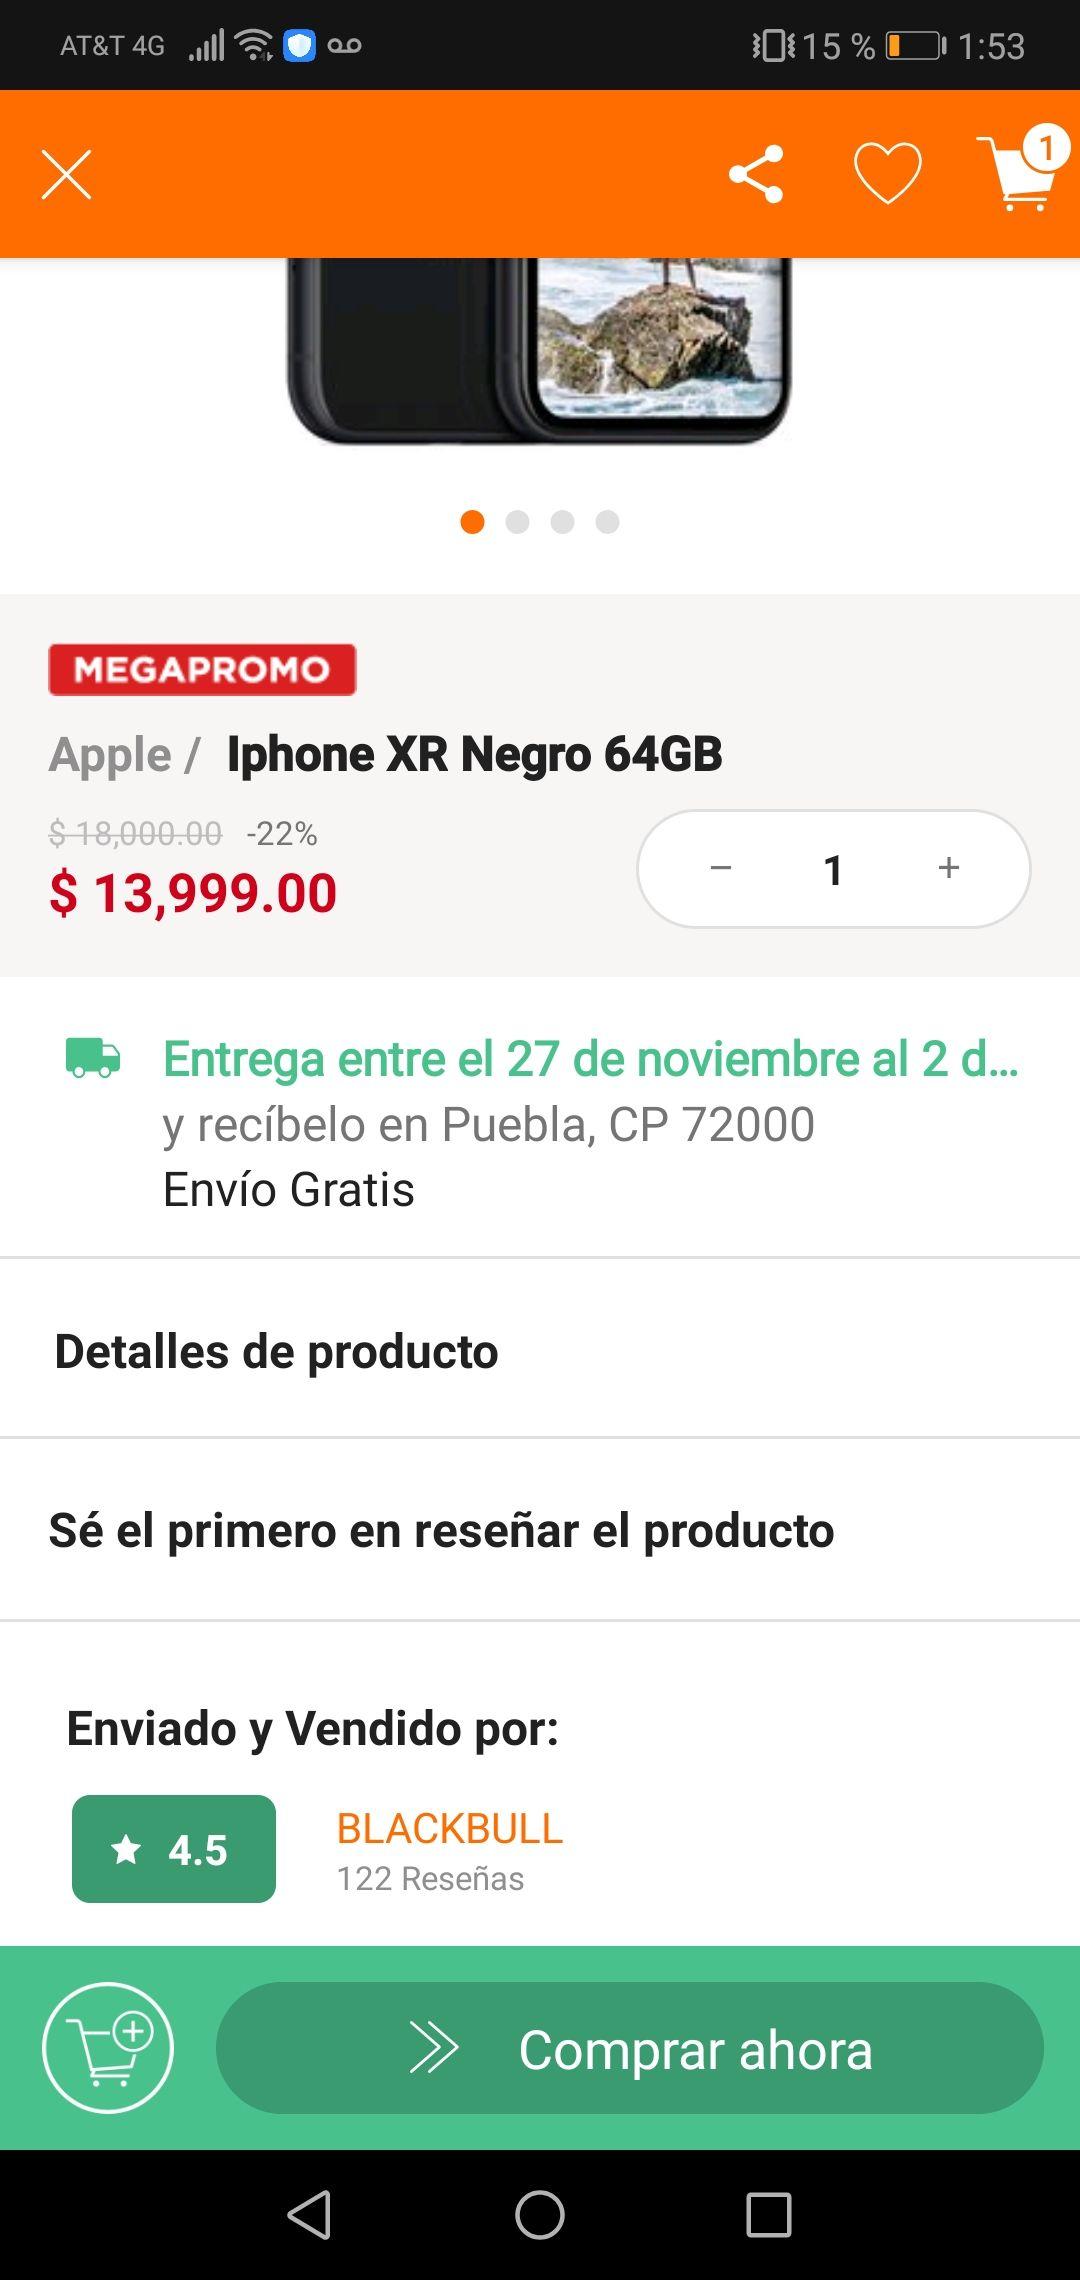 Linio: IPhone xr 64 gb negro en Linio (paypal+citibanamex)